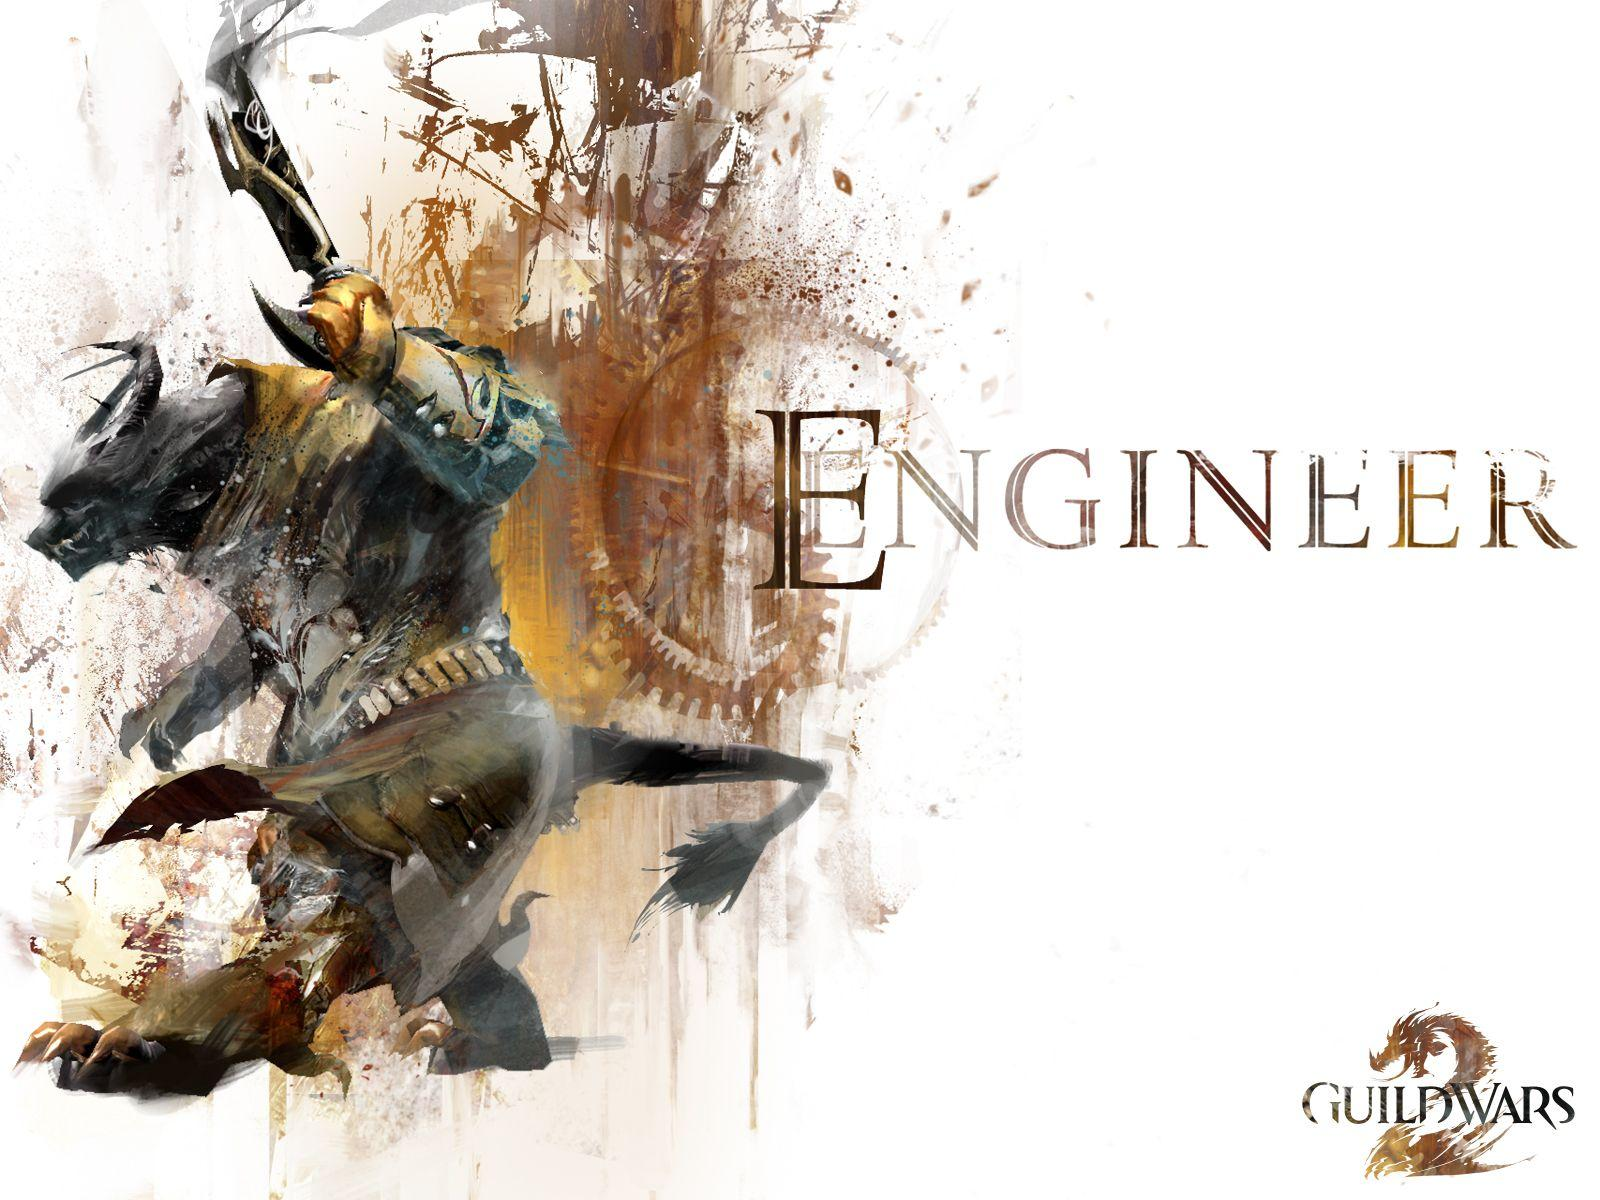 mechanical engineering logo hd